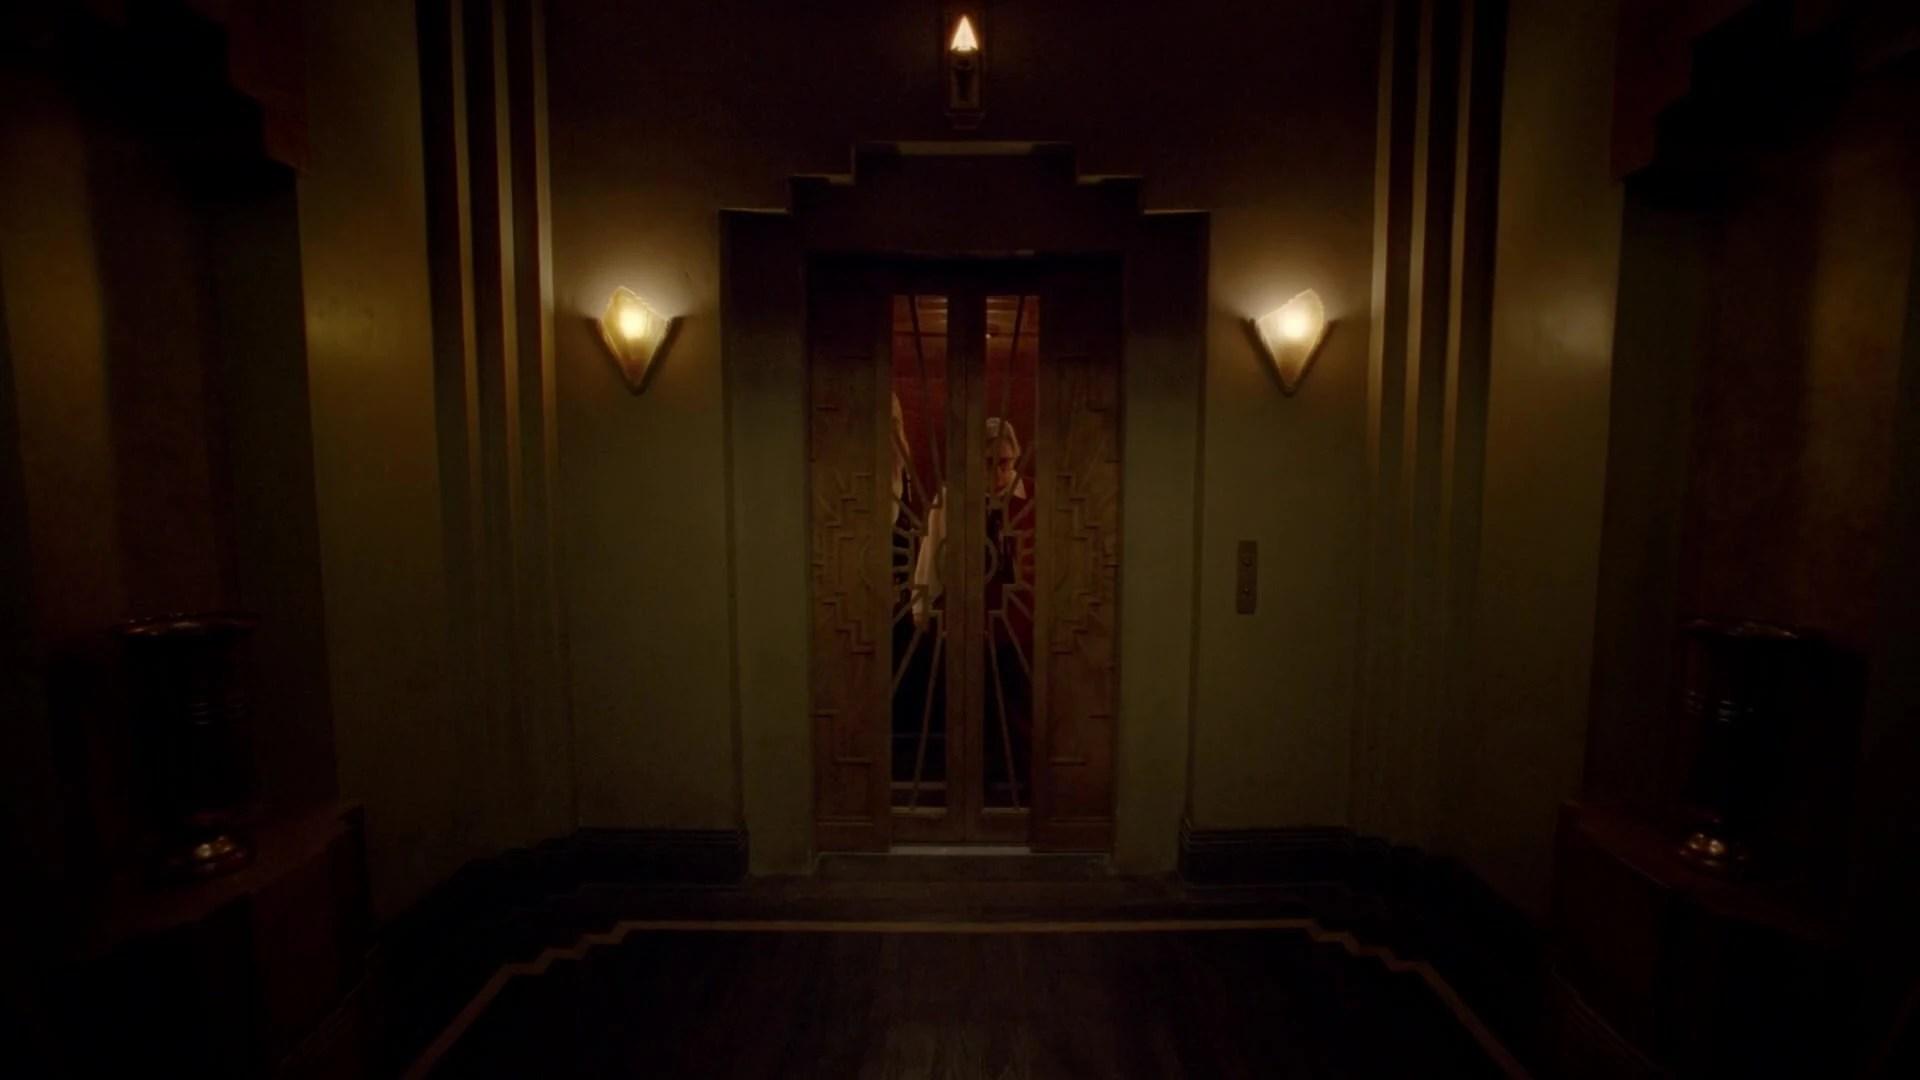 Hotel Cortez Elevator American Horror